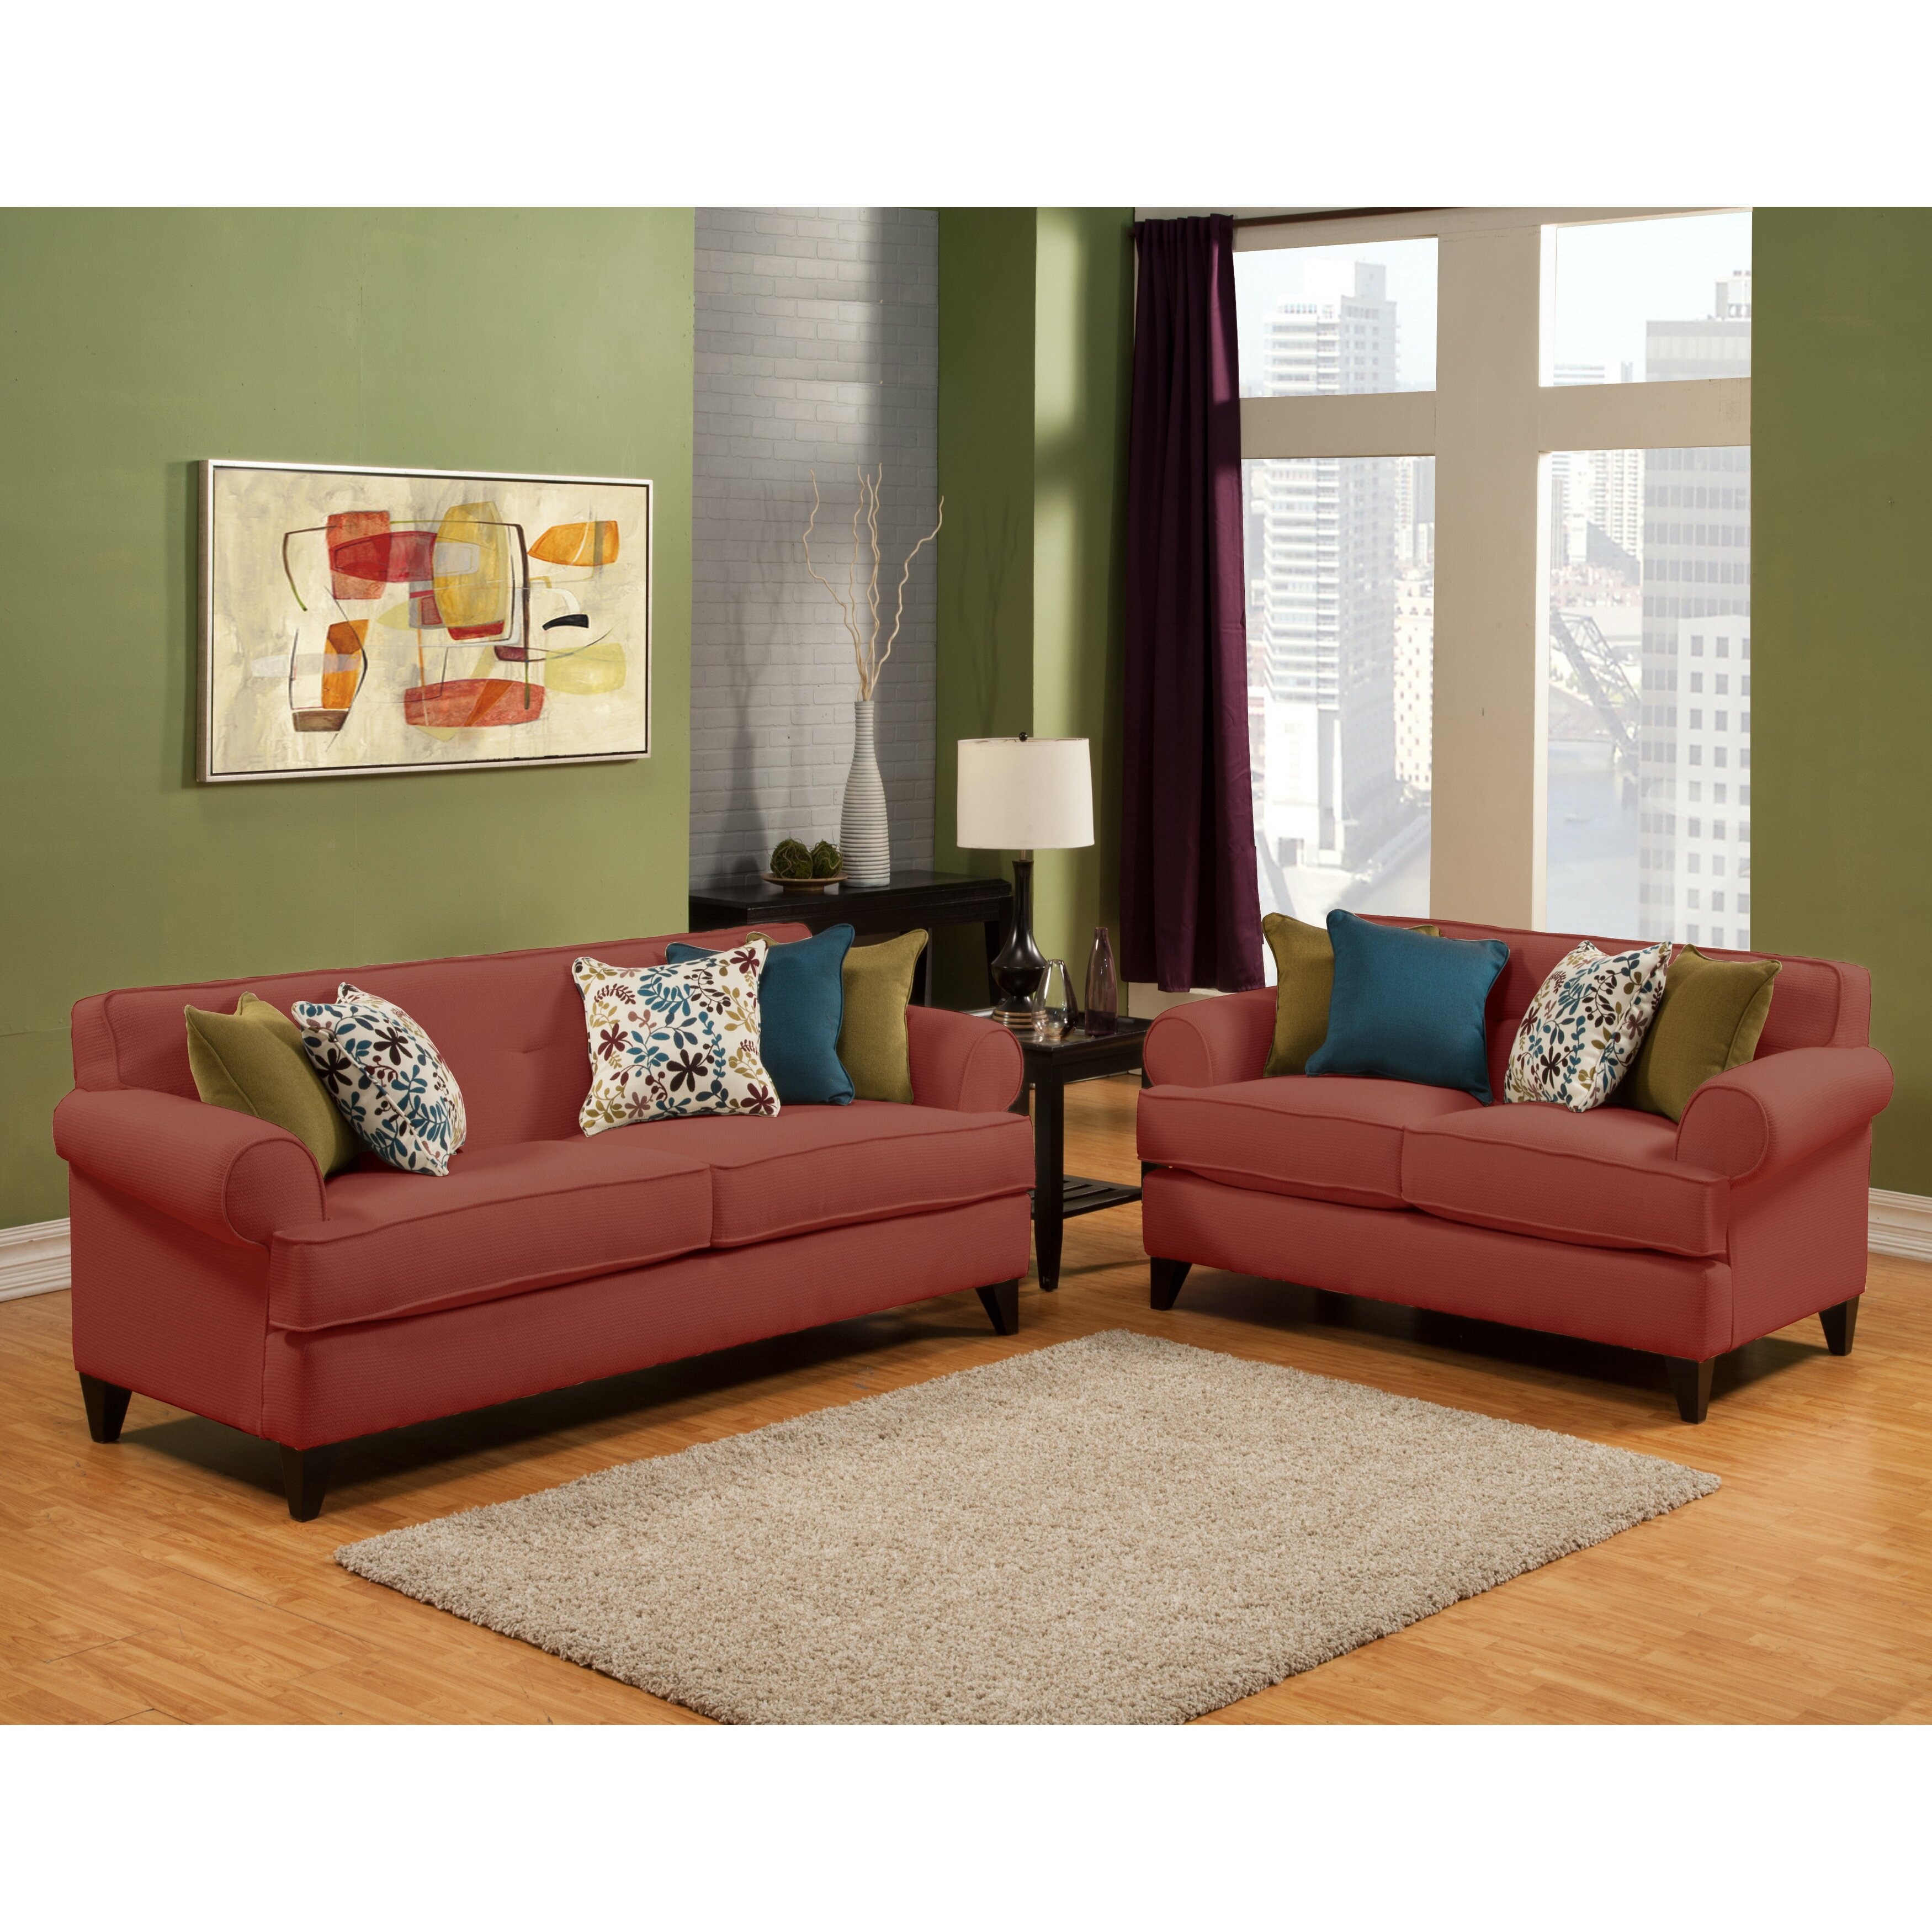 Hokku designs nevis living room collection reviews for Hokku designs living room furniture